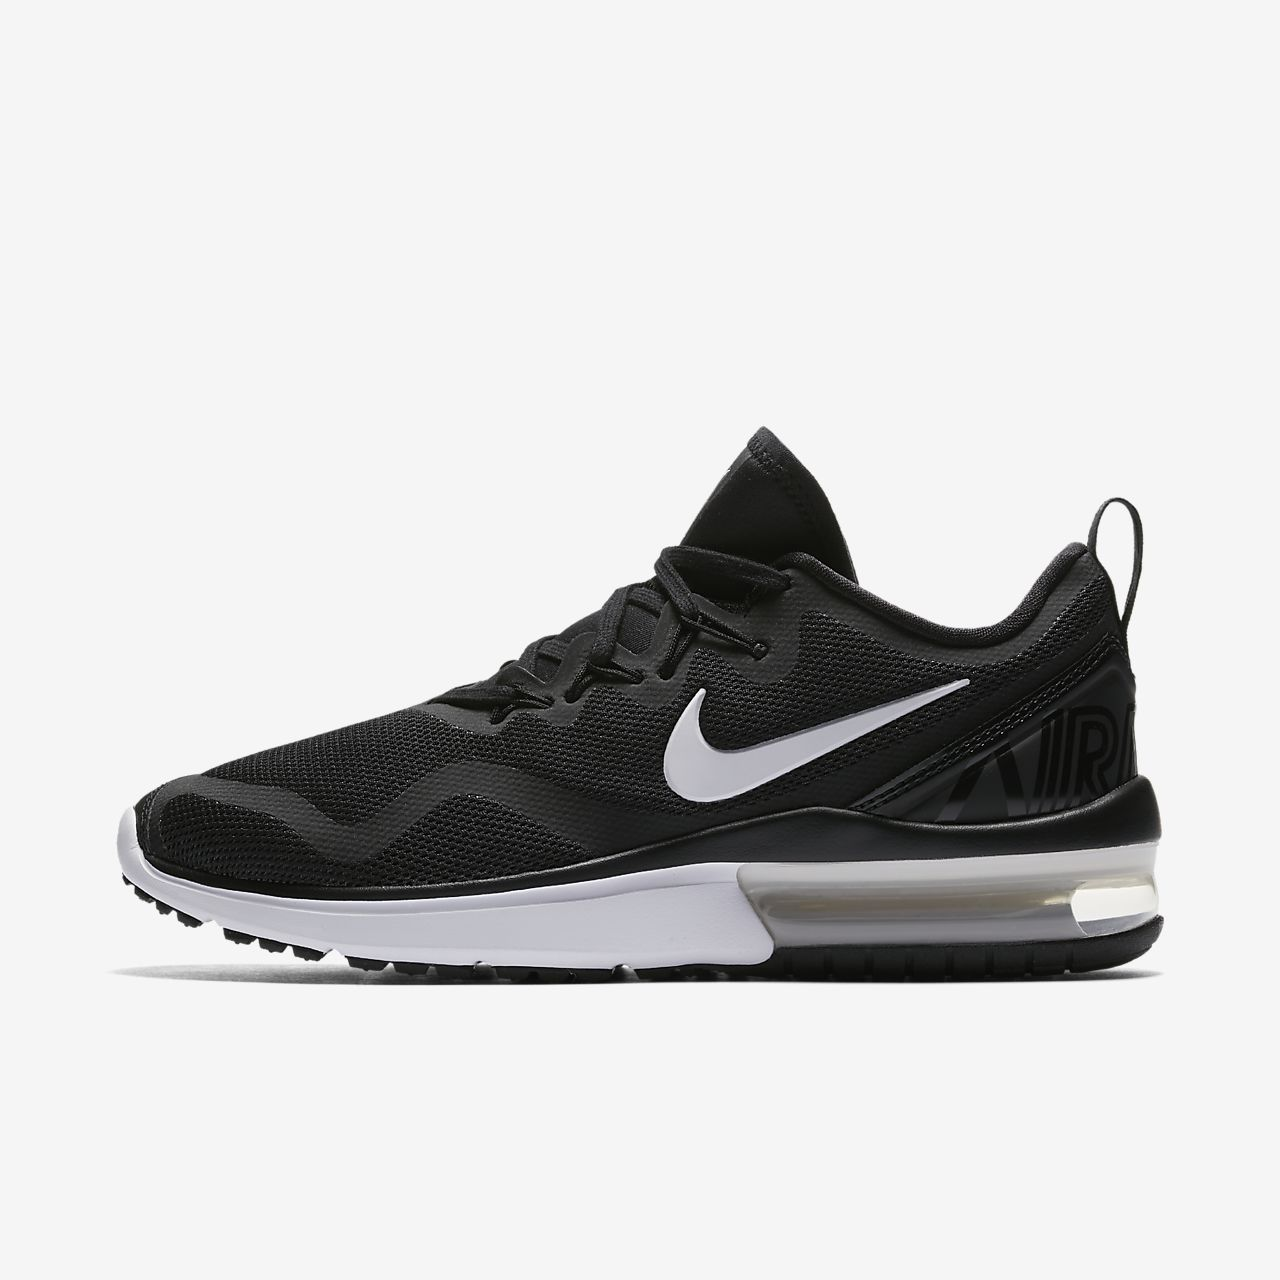 Nike Air Max Fury Women's Shoe